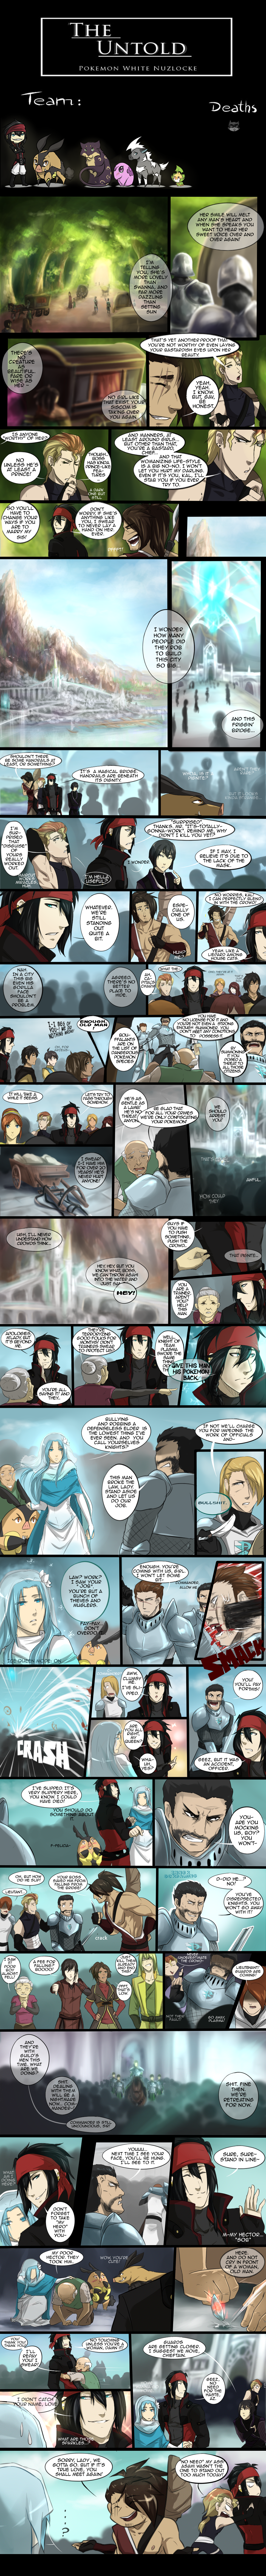 The Untold - part 41 by Antarija